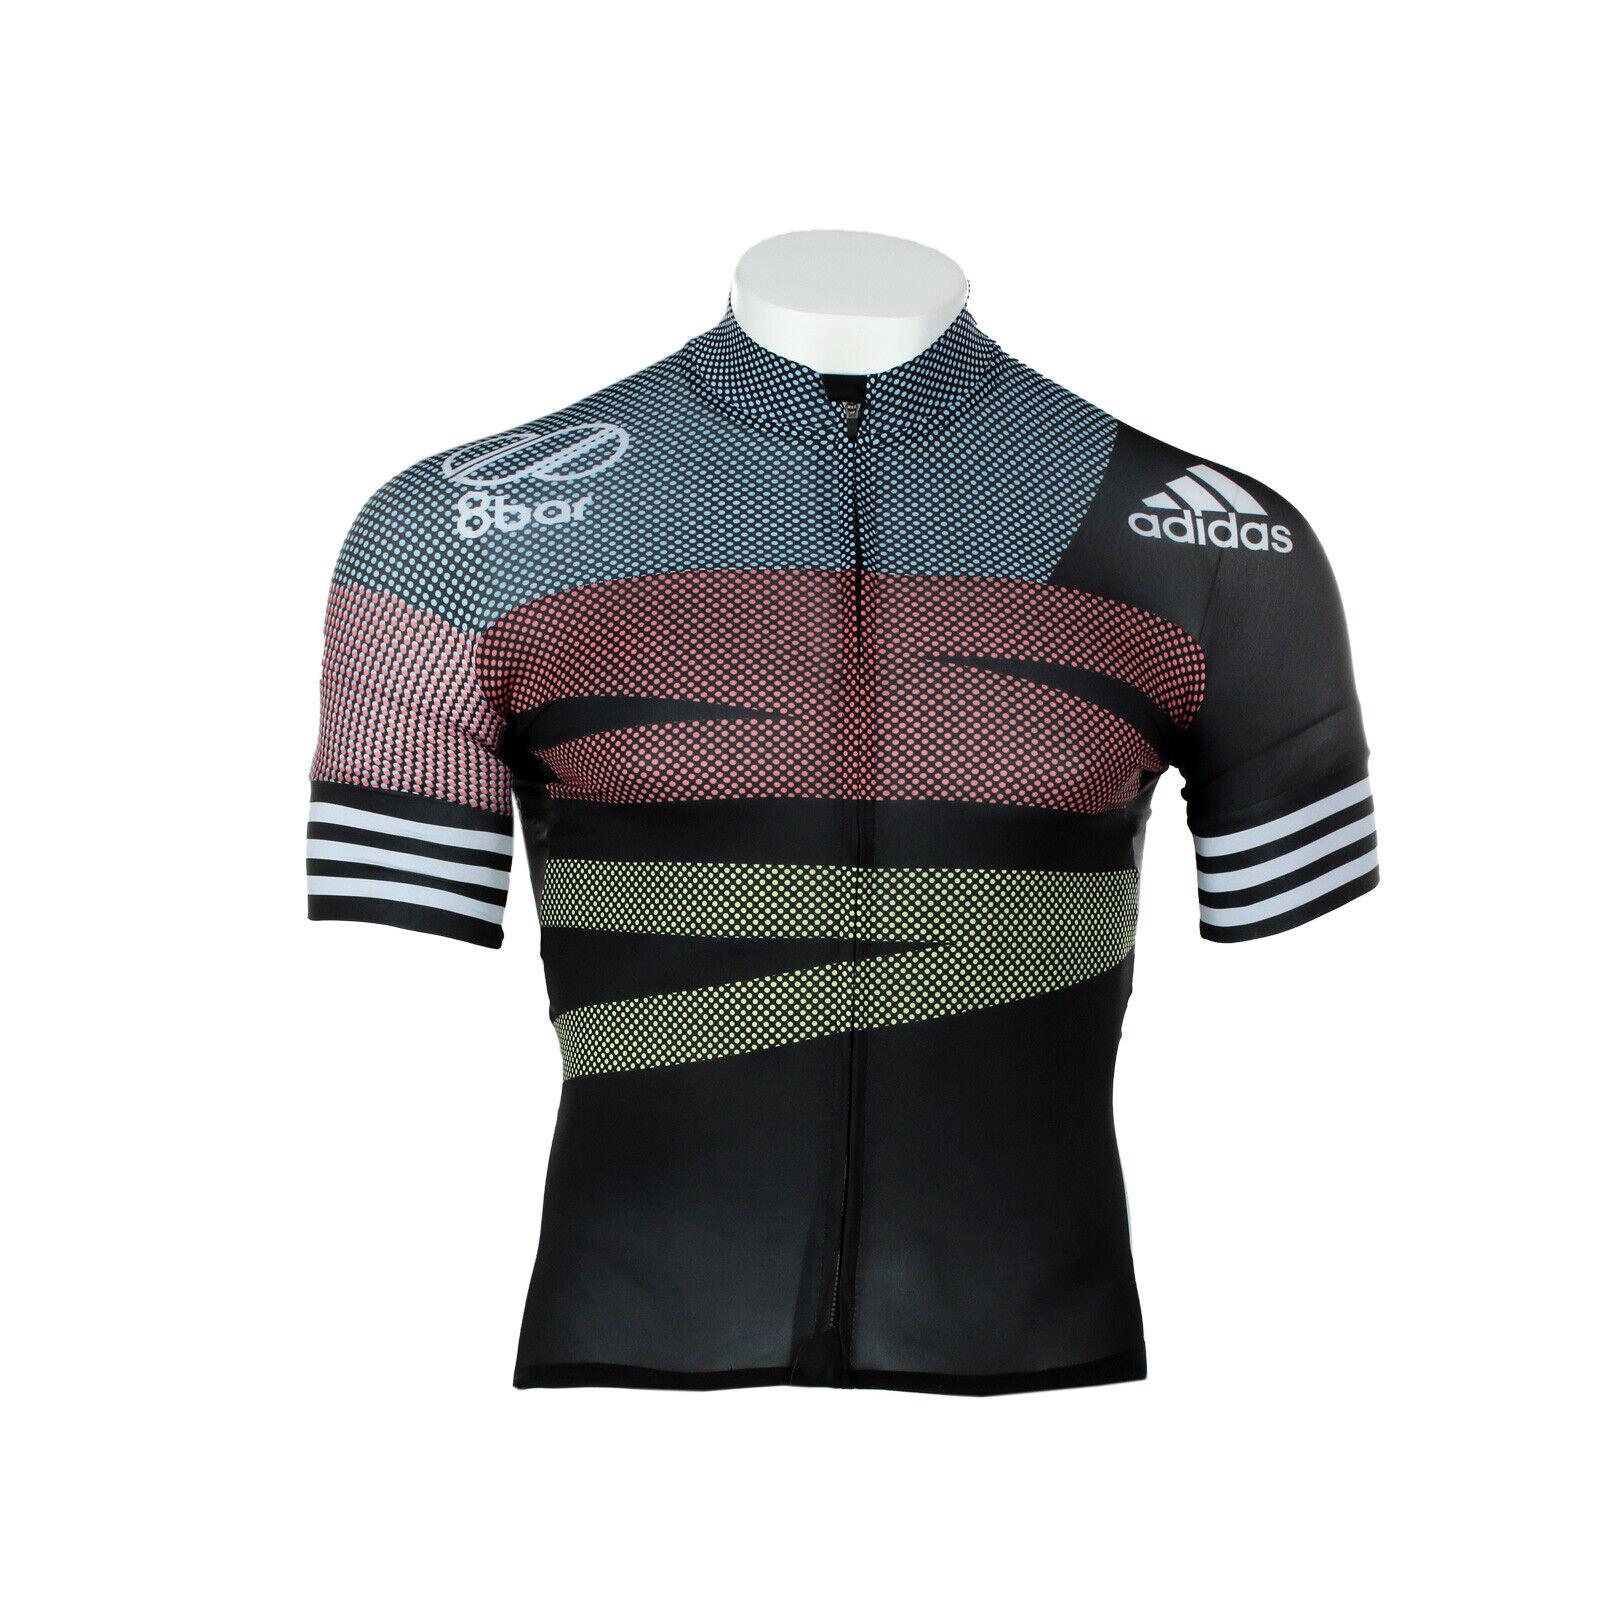 Adidas rueda camiseta J. SS. K. 8bar s bq6779 bicicleta camiseta ciclismo Cycling Bike